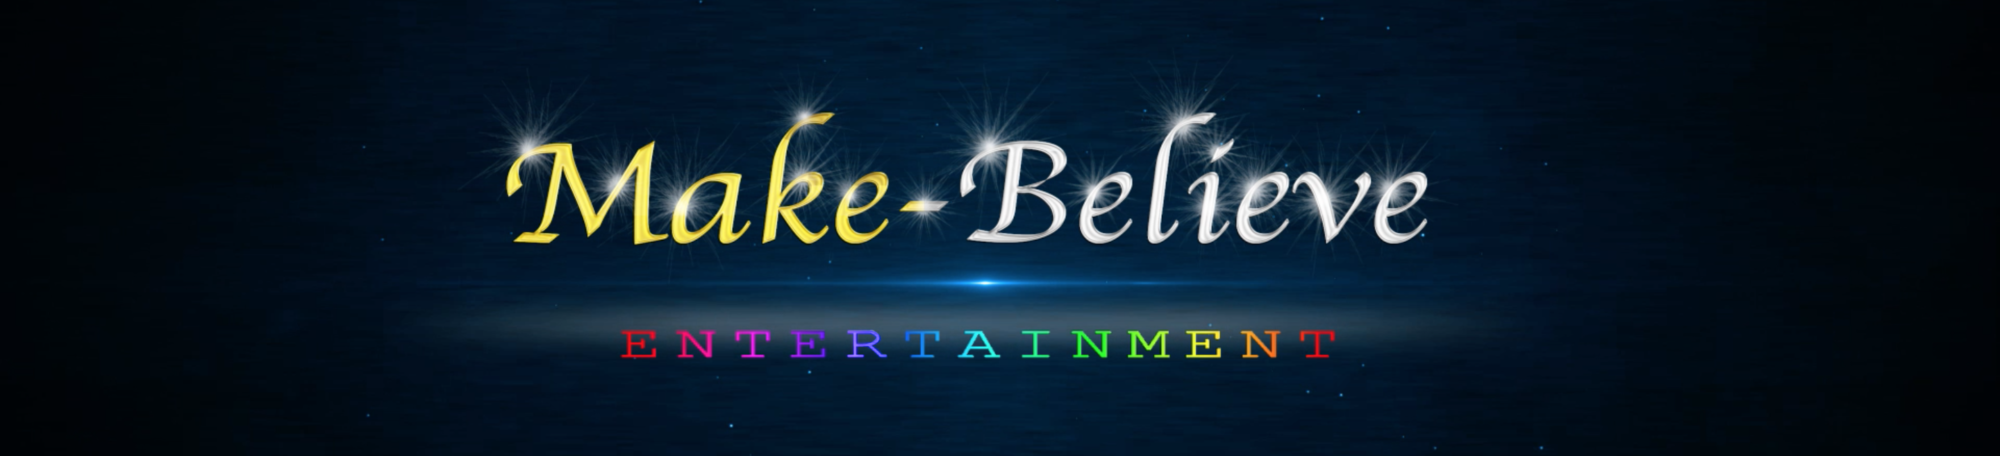 Make-Believe Entertainment